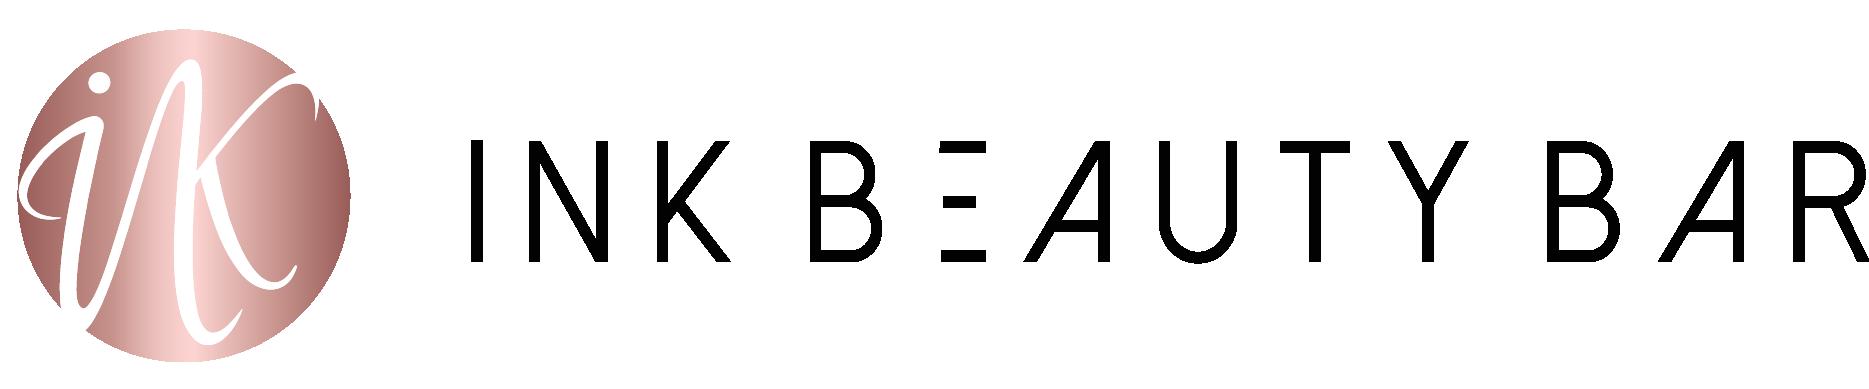 Ink Beauty Bar